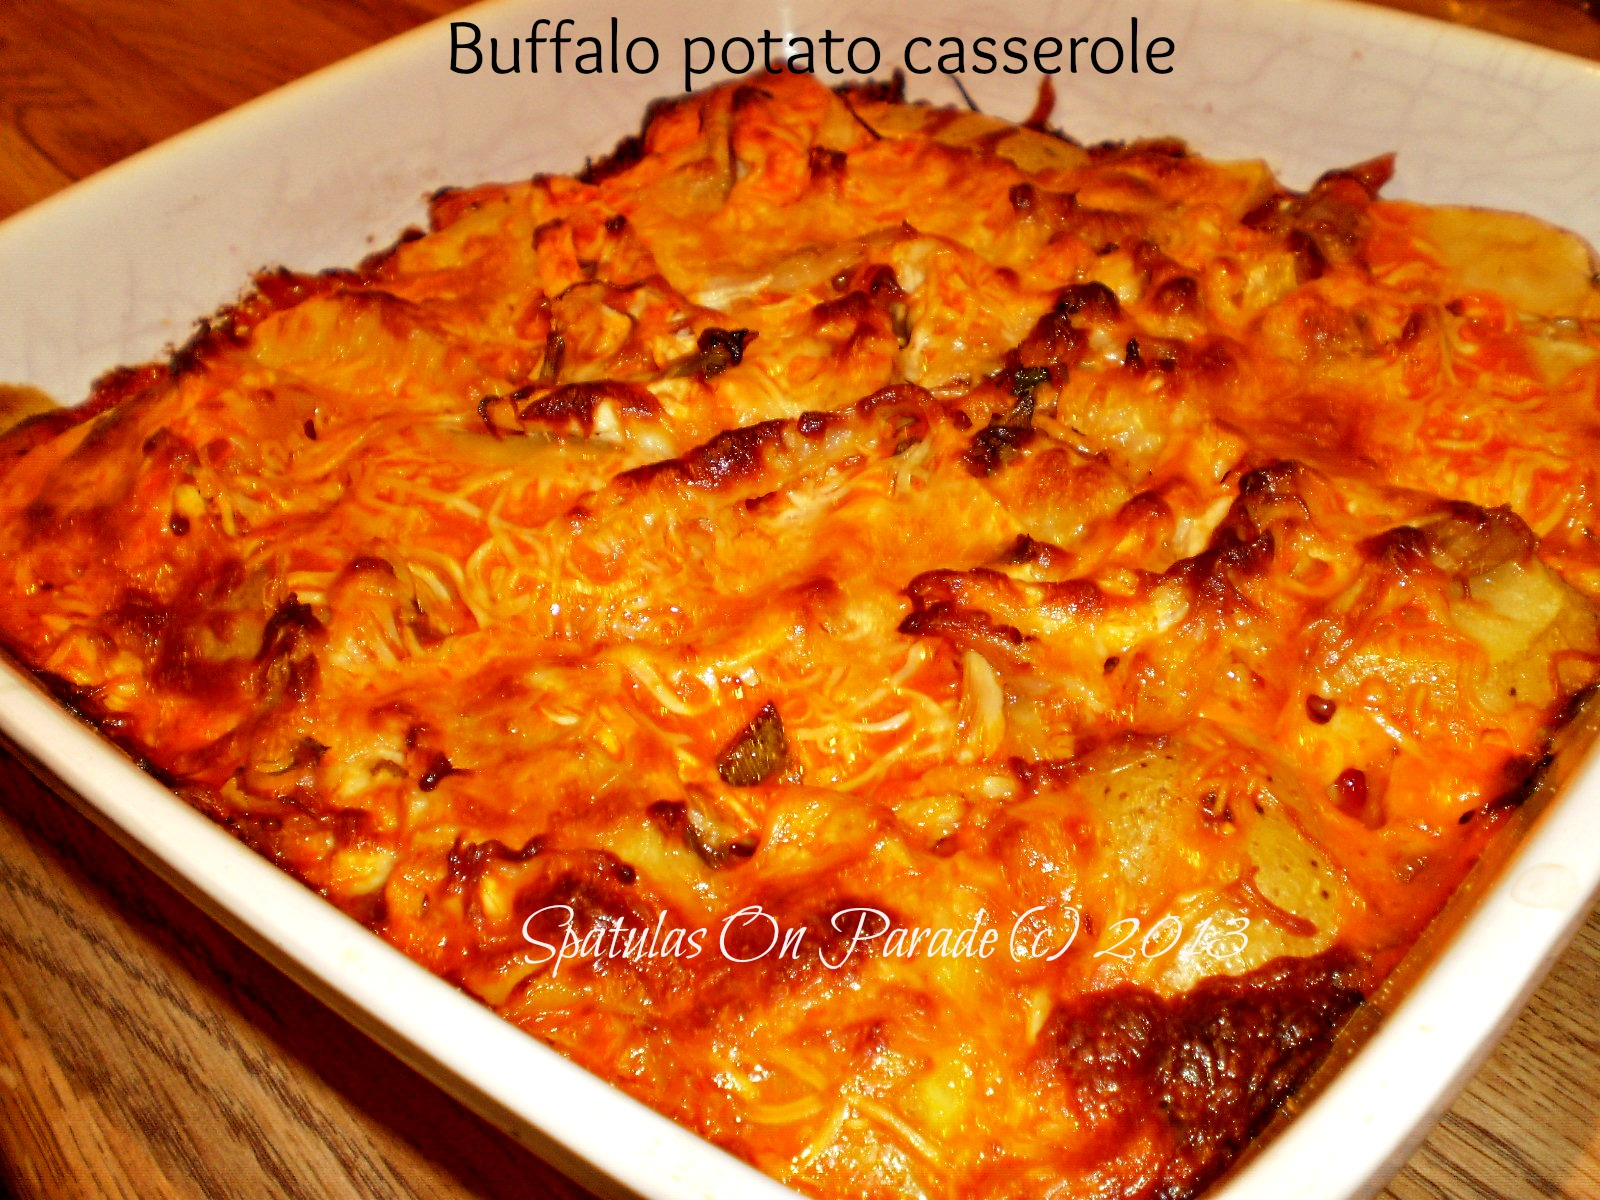 Spatulas On Parade: Buffalo Chicken Potato Casserole